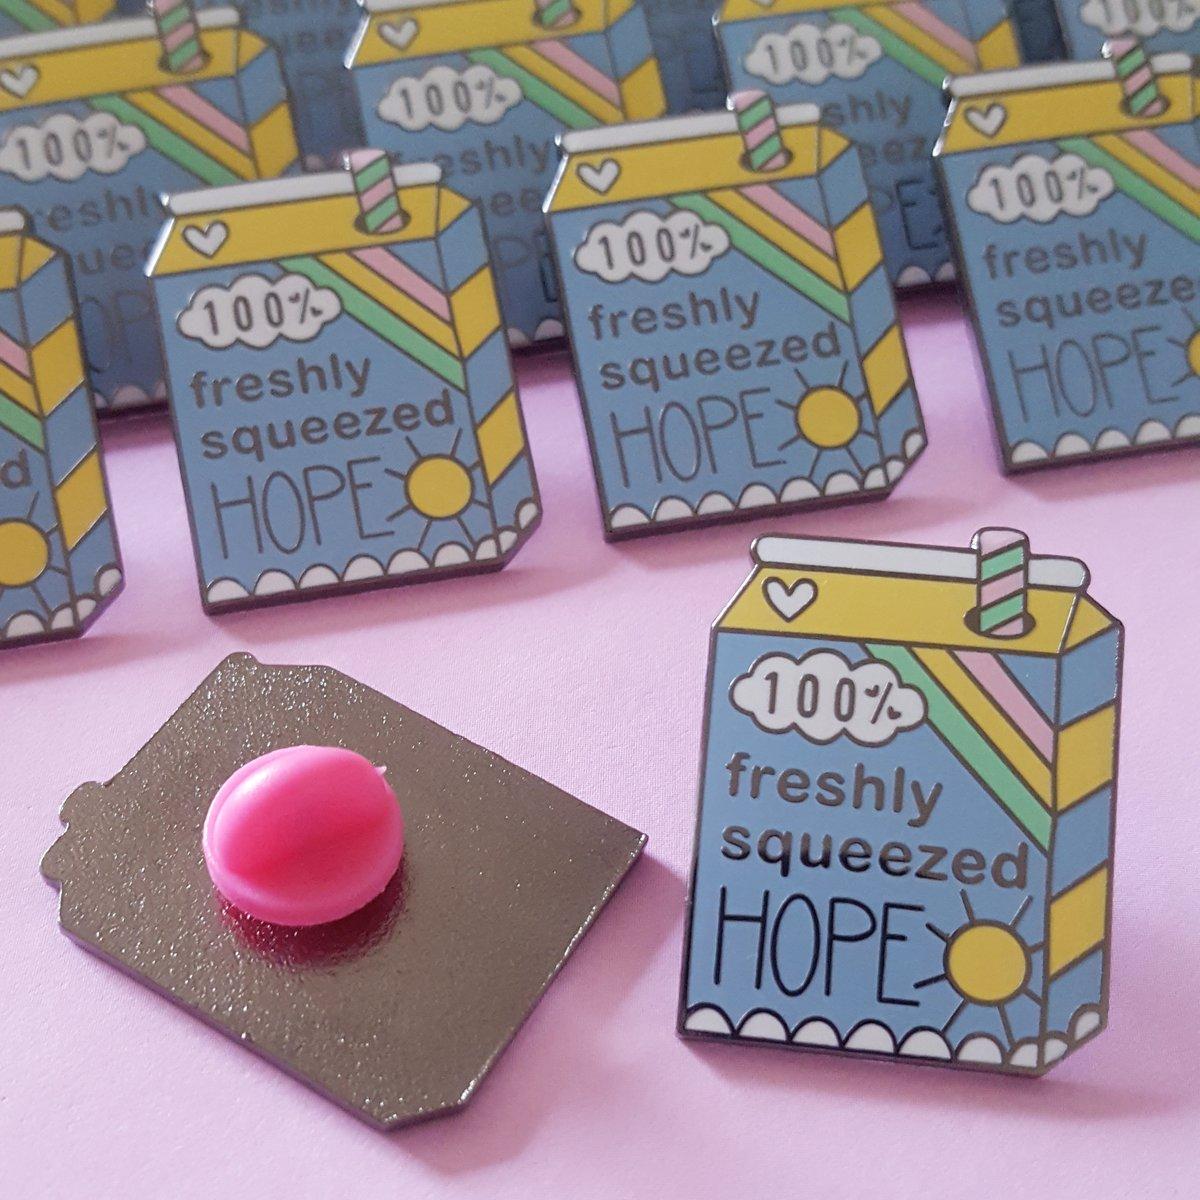 100% Fresh Squeezed Hope Enamel Pin